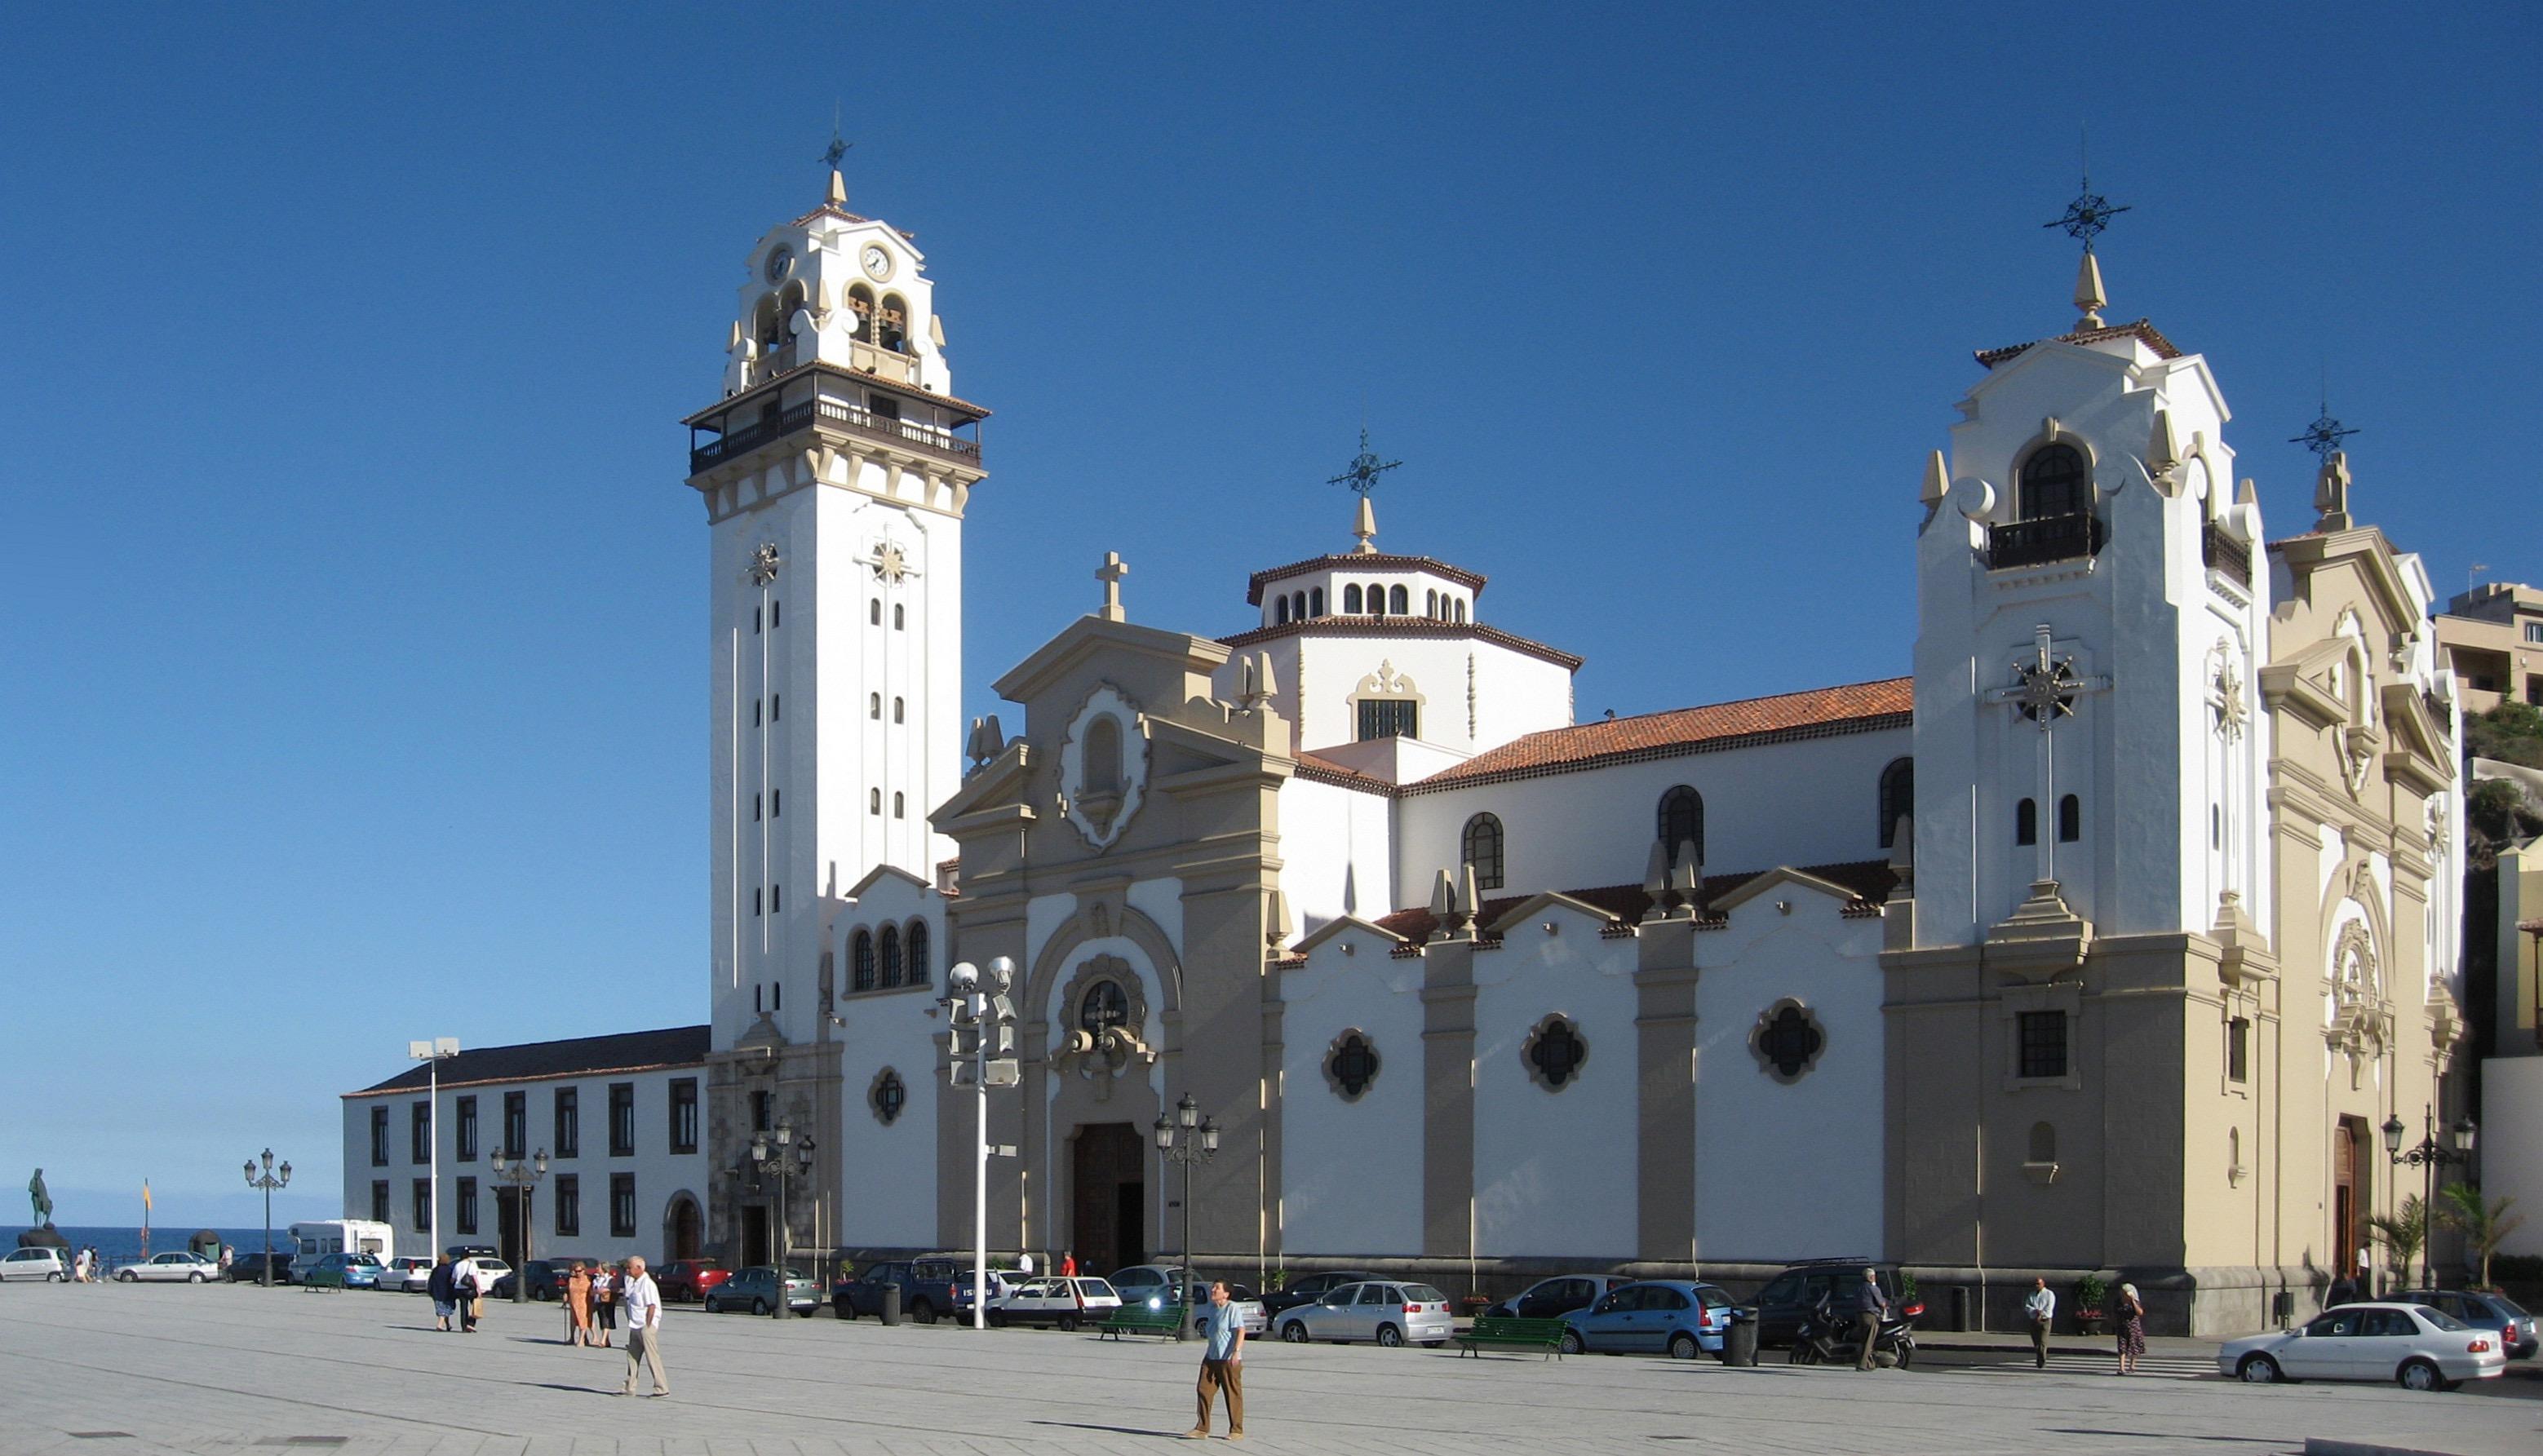 Tenerife.candelaria.exterior.basilica